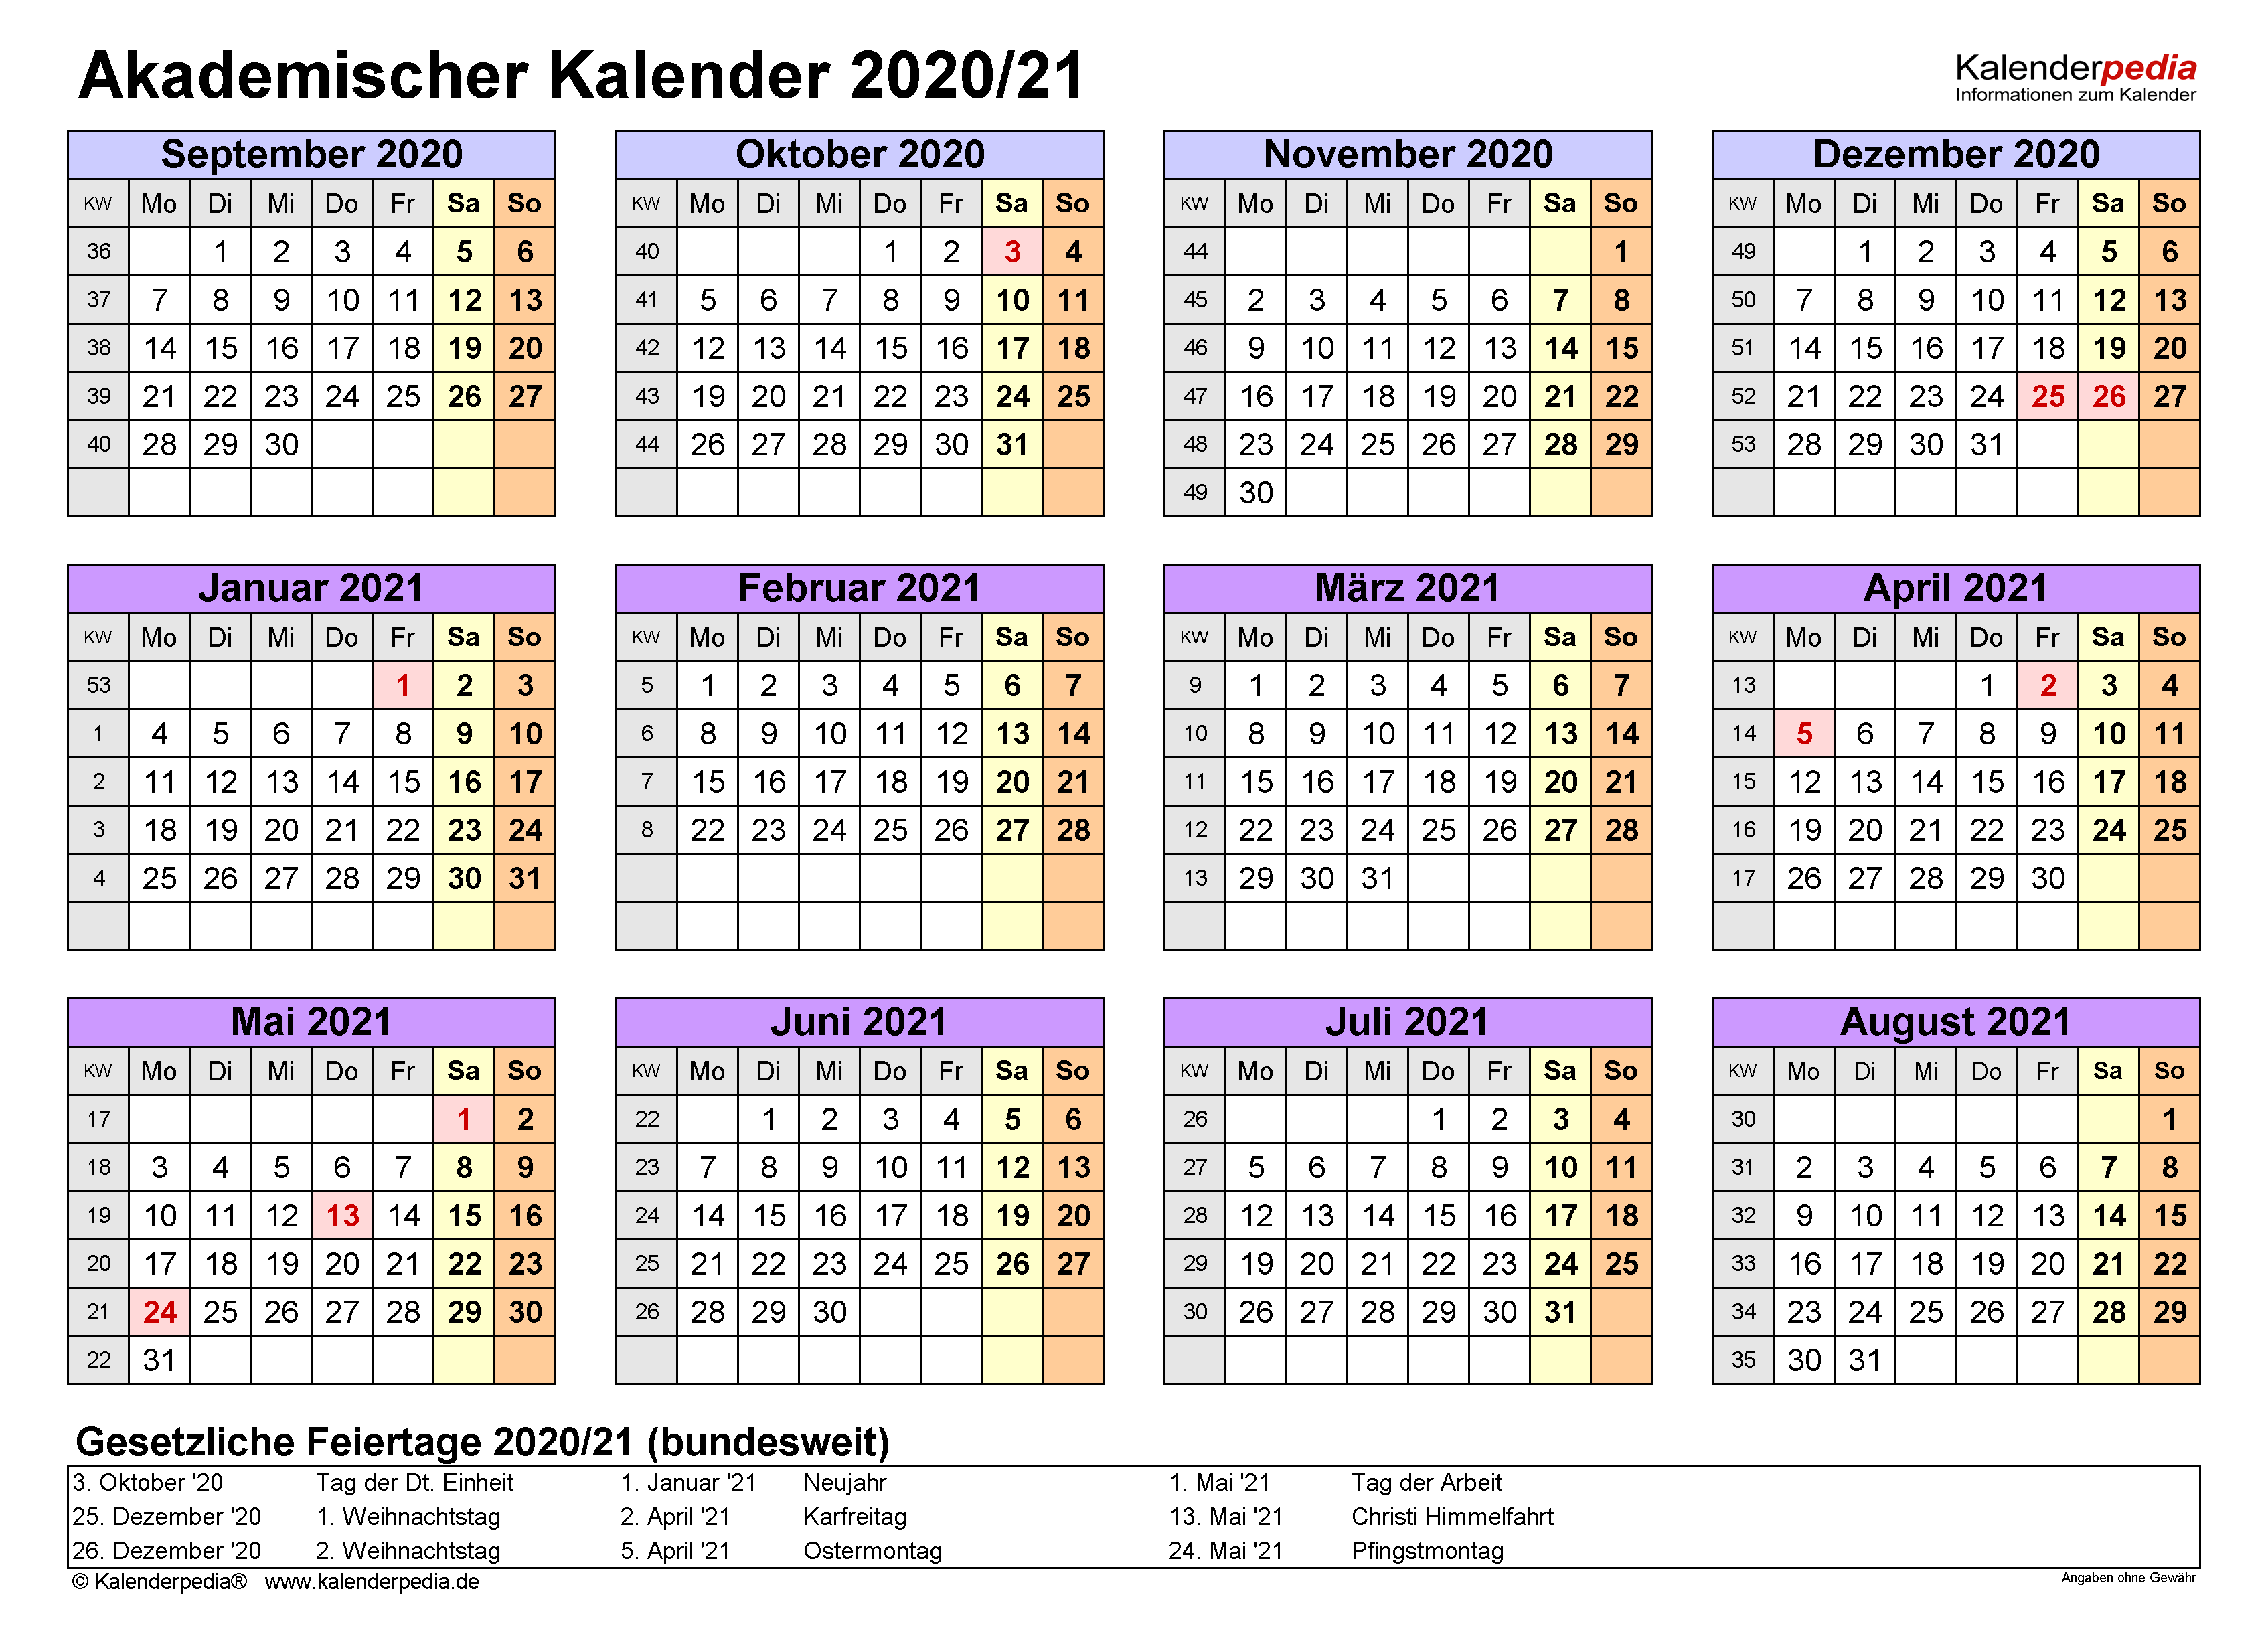 Aktuelle Kalenderwoche 2021